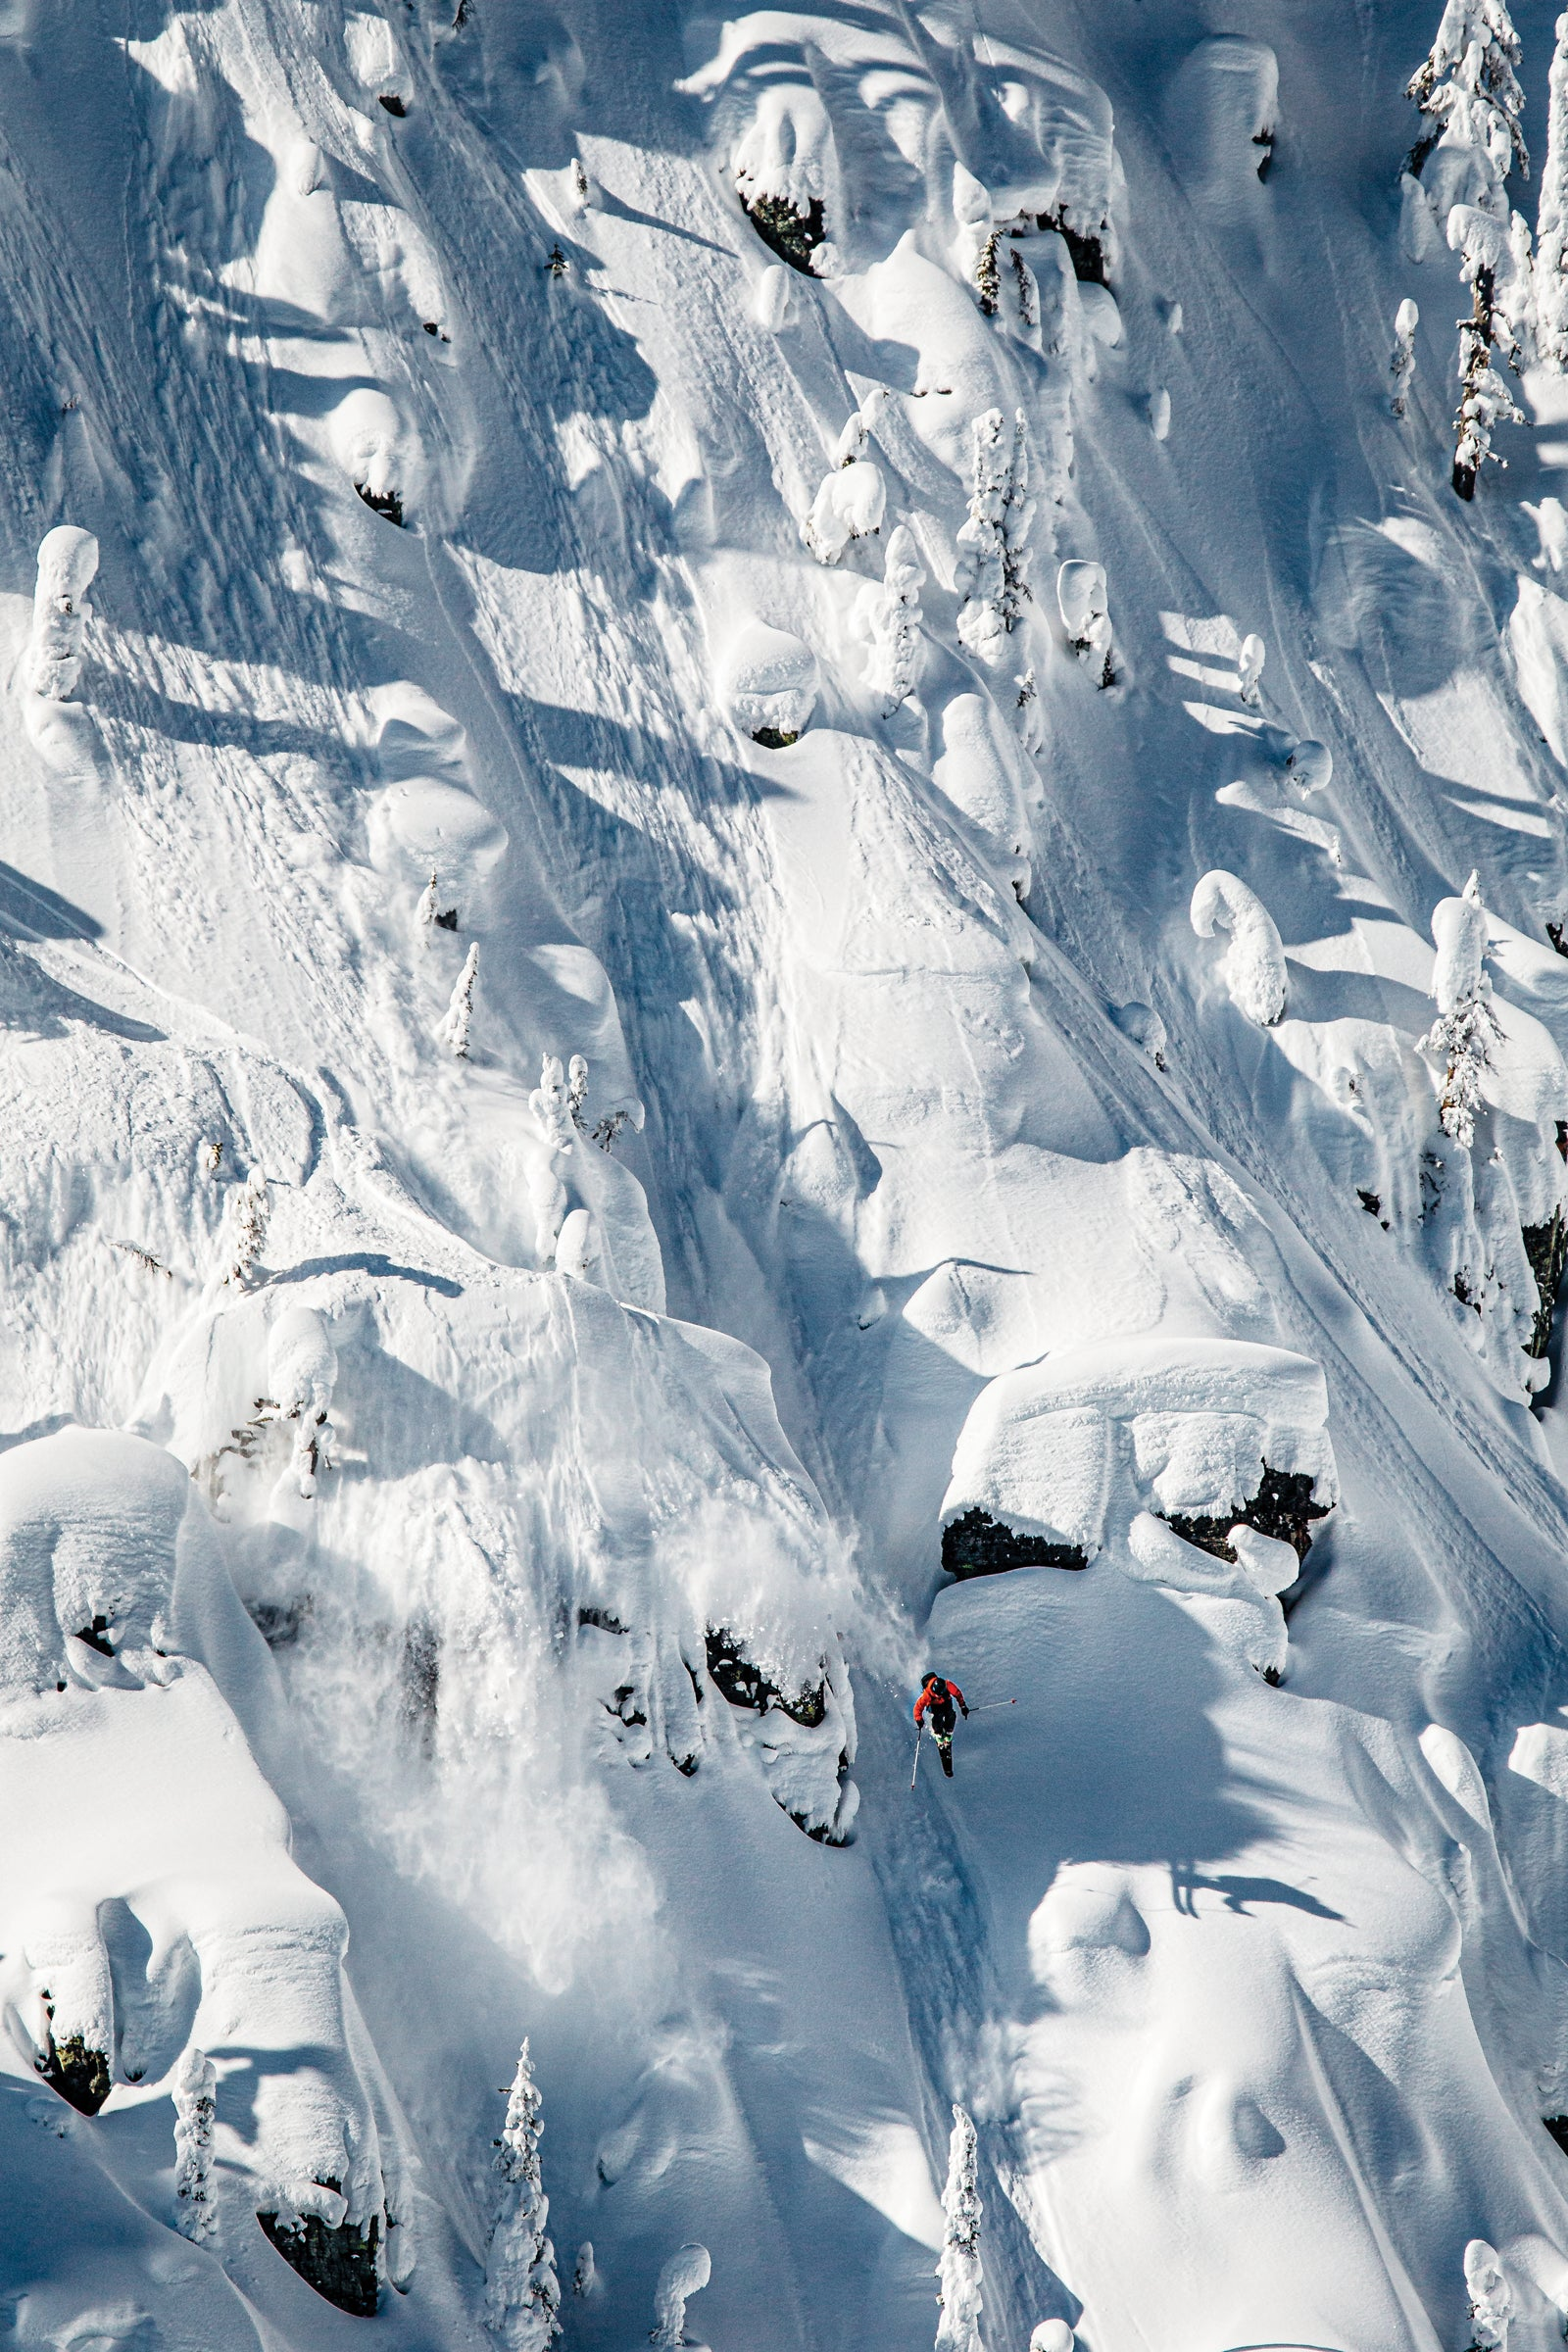 Parkin Costain Skiing Pillows in Northwestern Montana